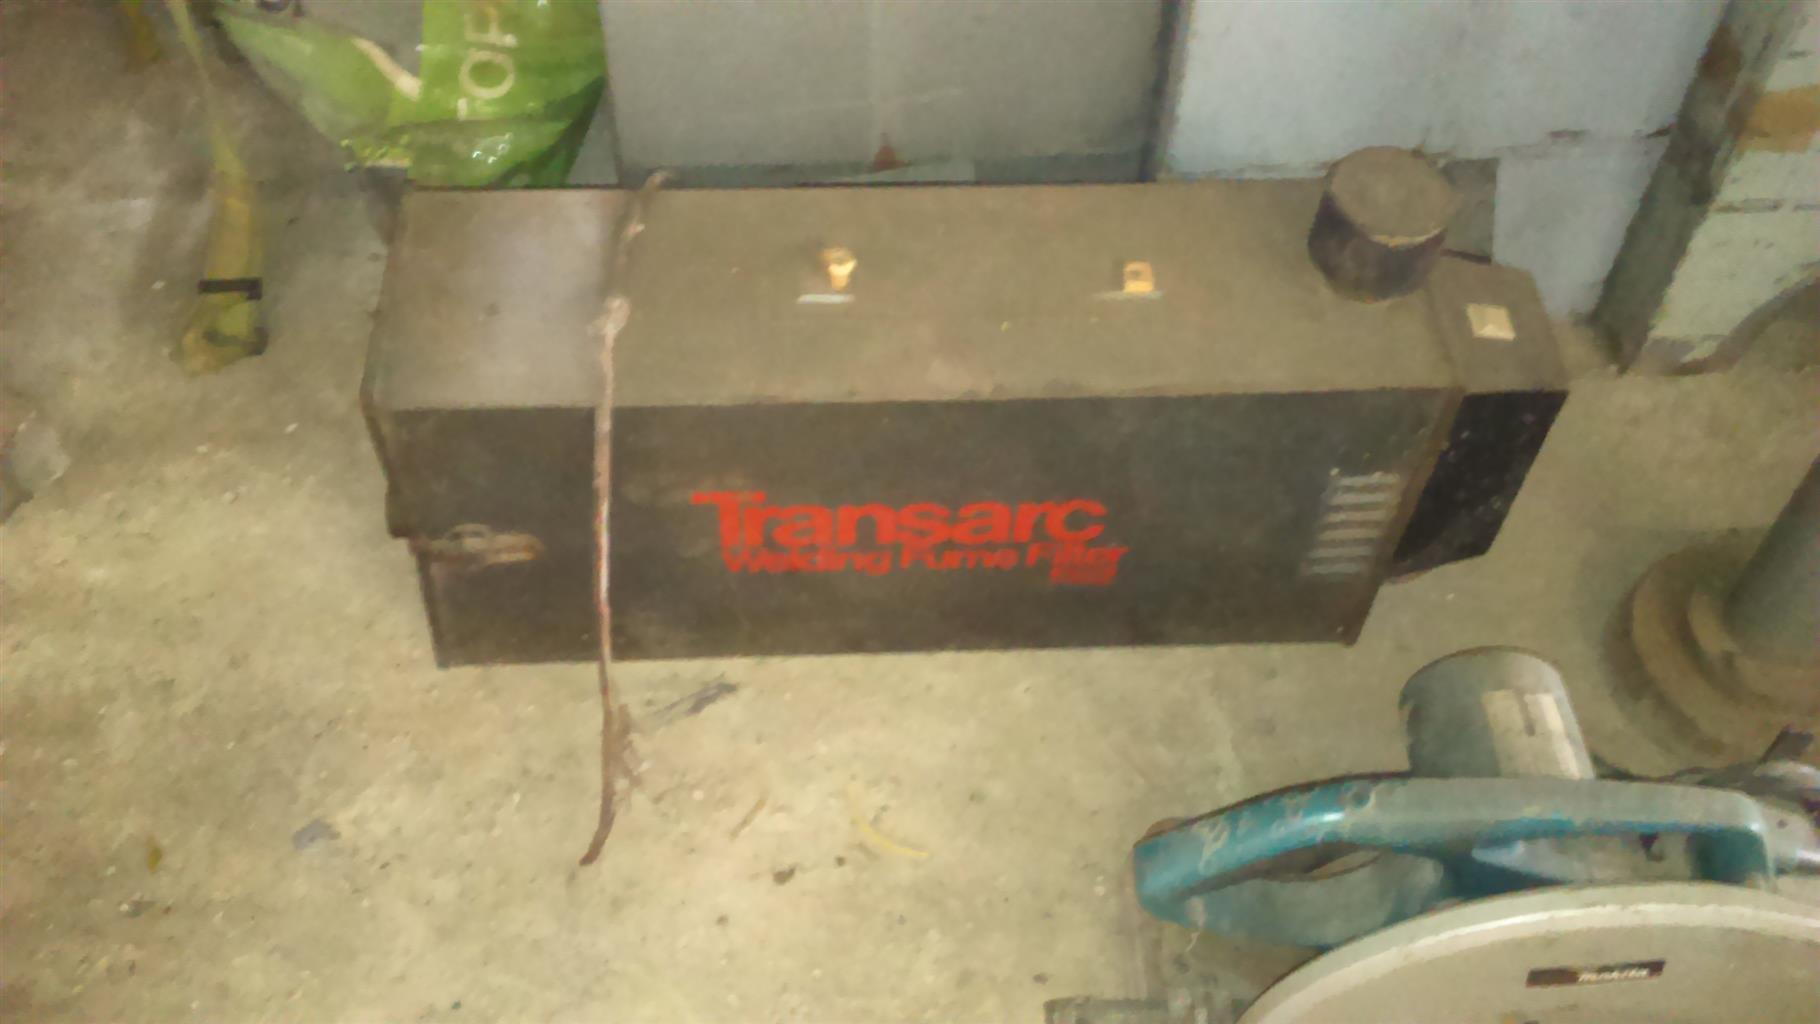 Transarc welding fume filter